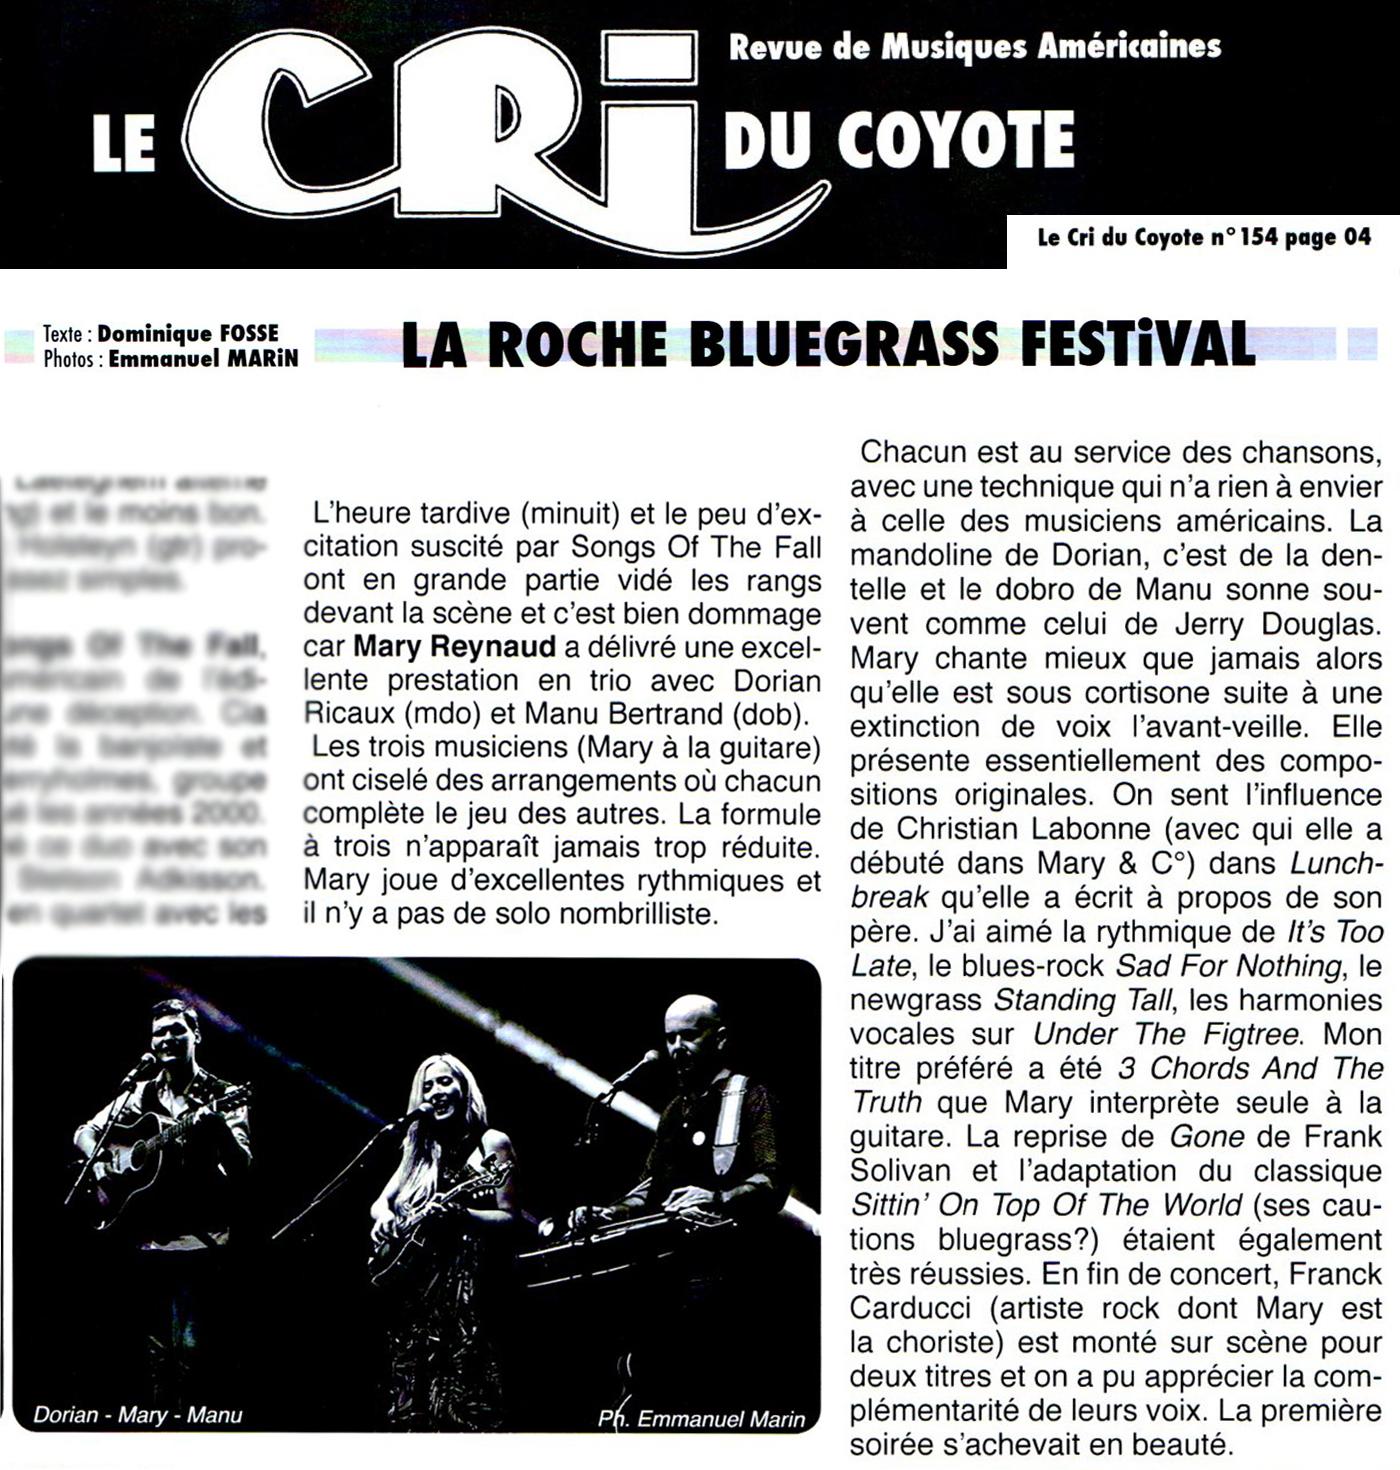 Le Cri du Coyote - 09/2017